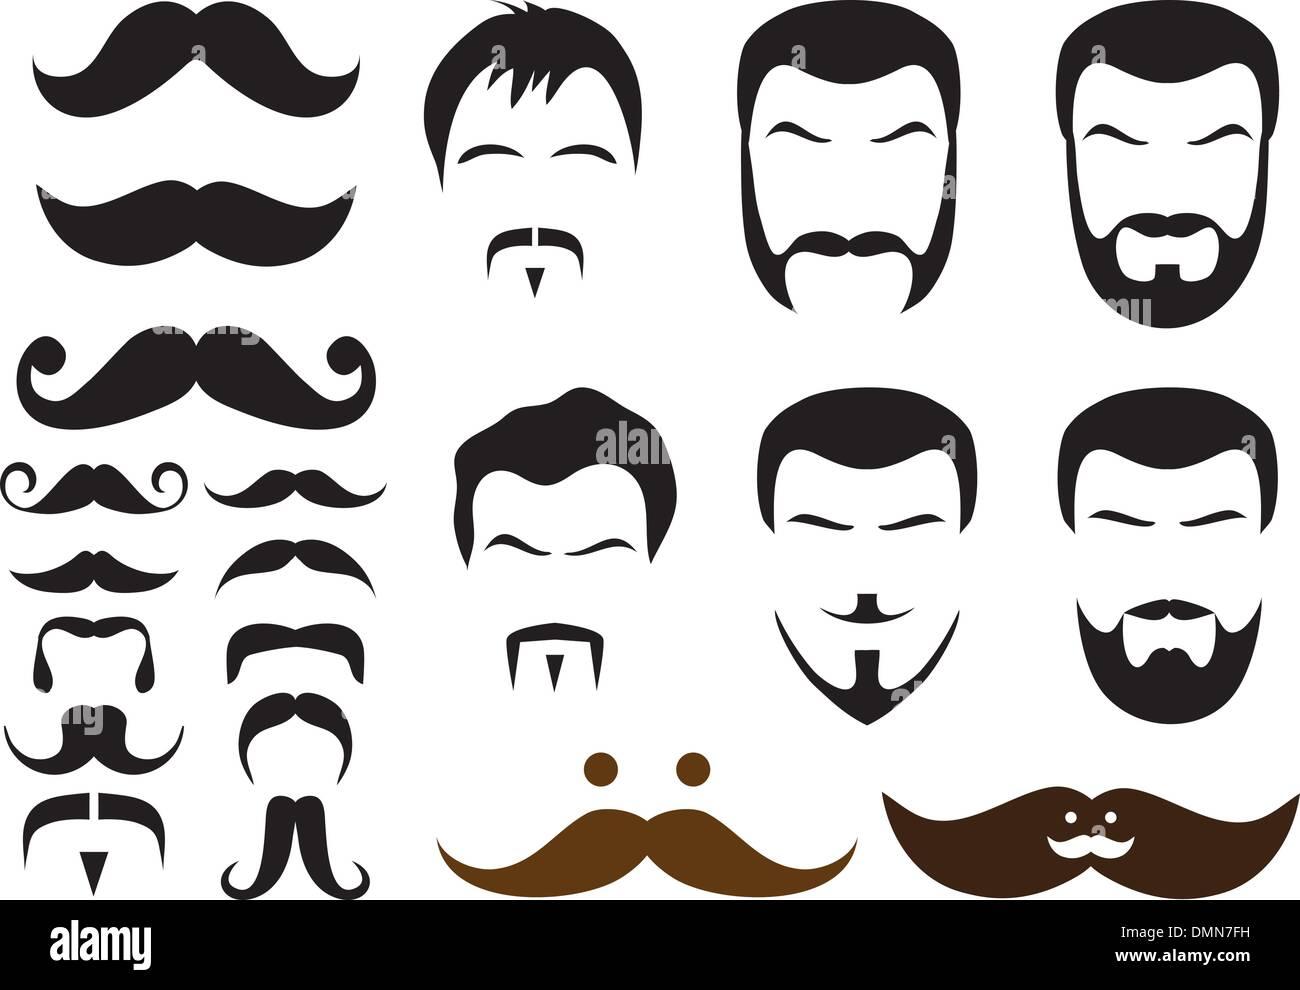 Pleasing Mustache And Beard Styles Vector Stock Vector Art Illustration Schematic Wiring Diagrams Amerangerunnerswayorg